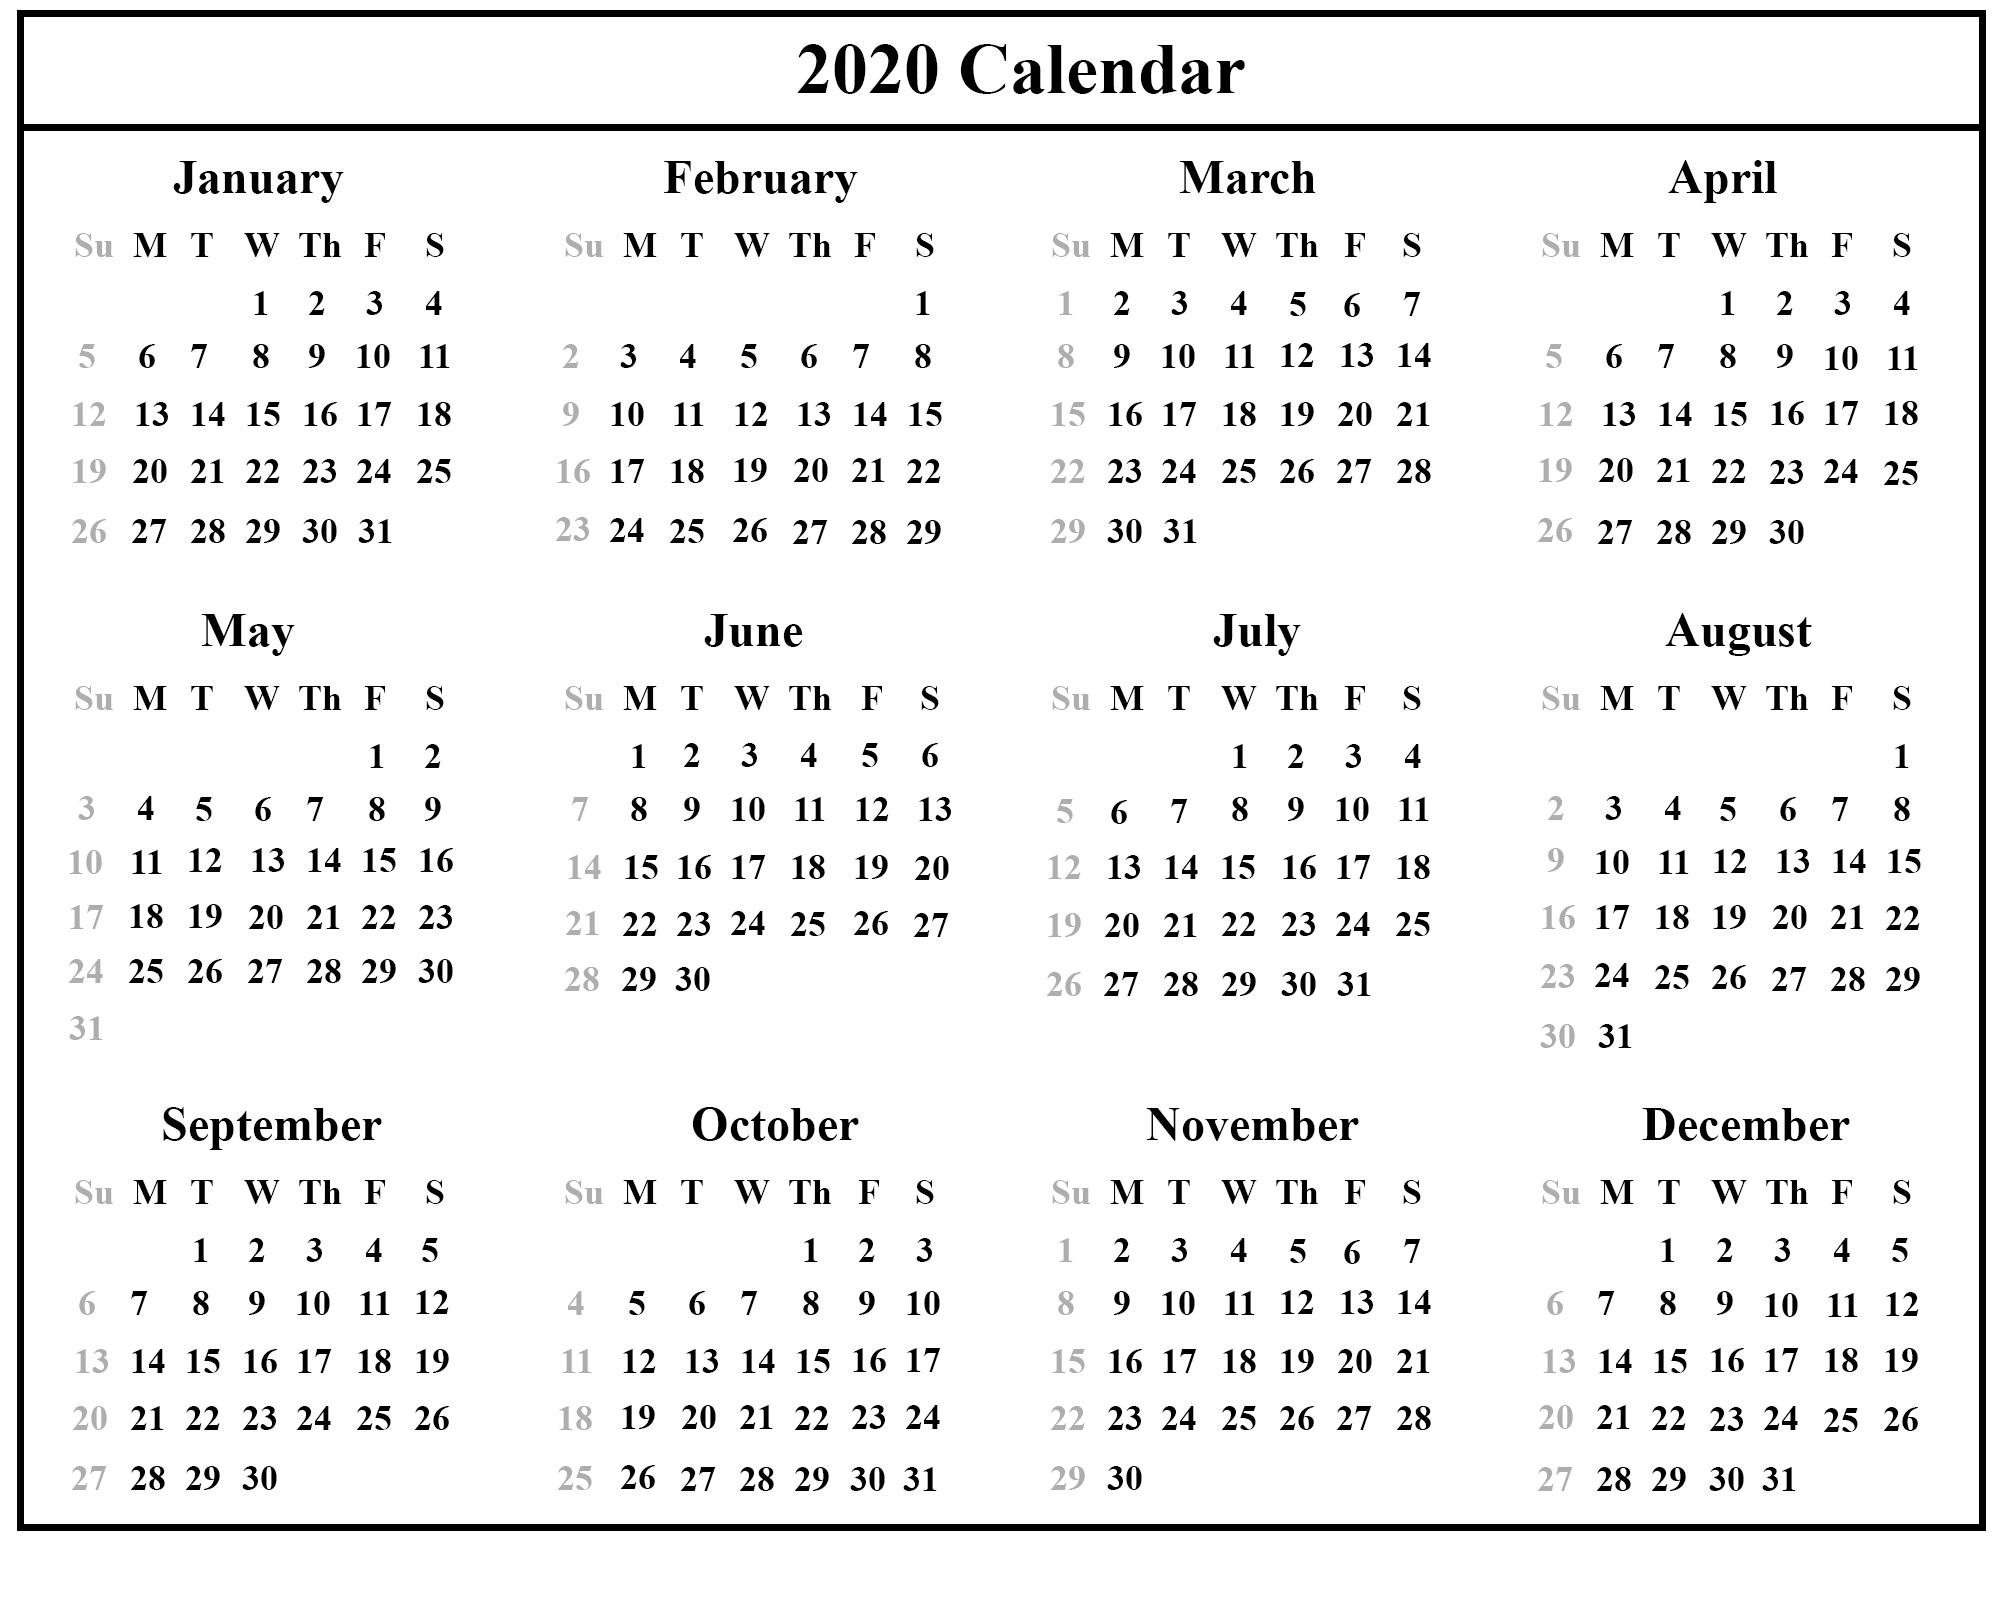 Free Printable Australia Calendar 2020 In Pdf, Excel & Word